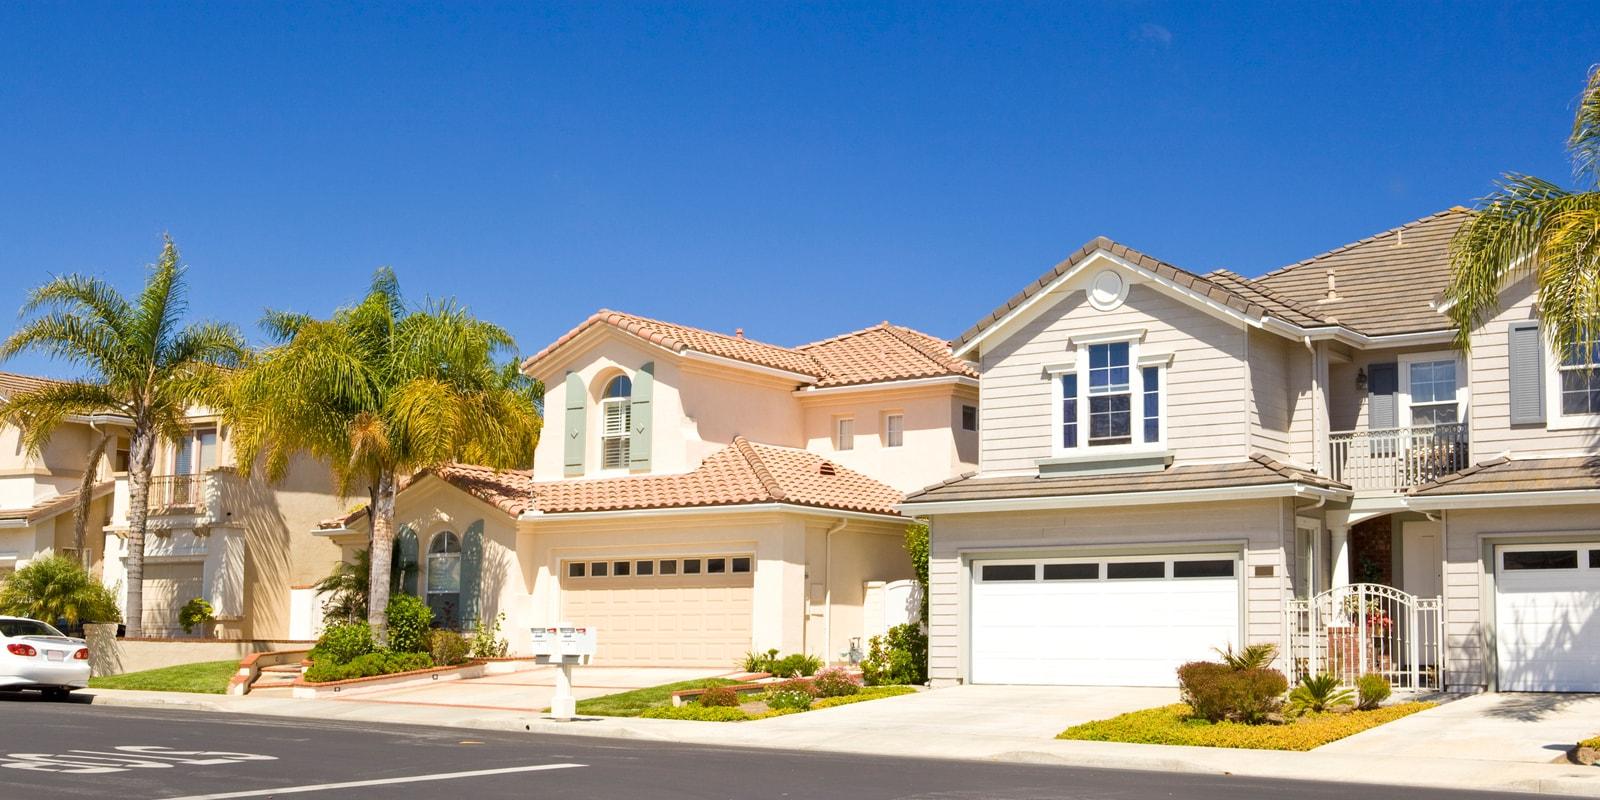 Homes in California